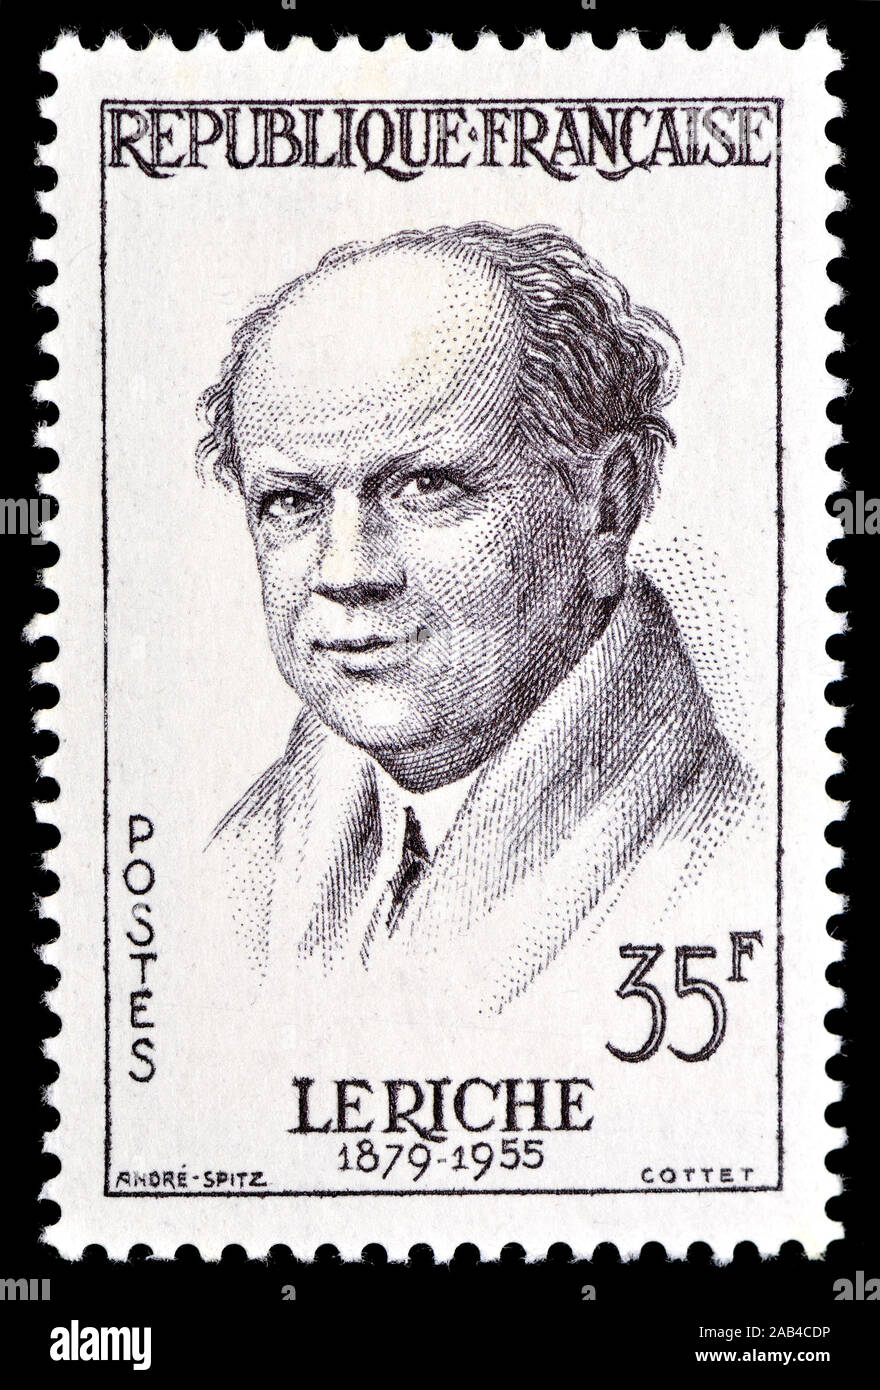 Sello francés (1958) : René Leriche (Henri Marie René Leriche: 1879 - 1955). Cirujano y fisiólogo francés Foto de stock